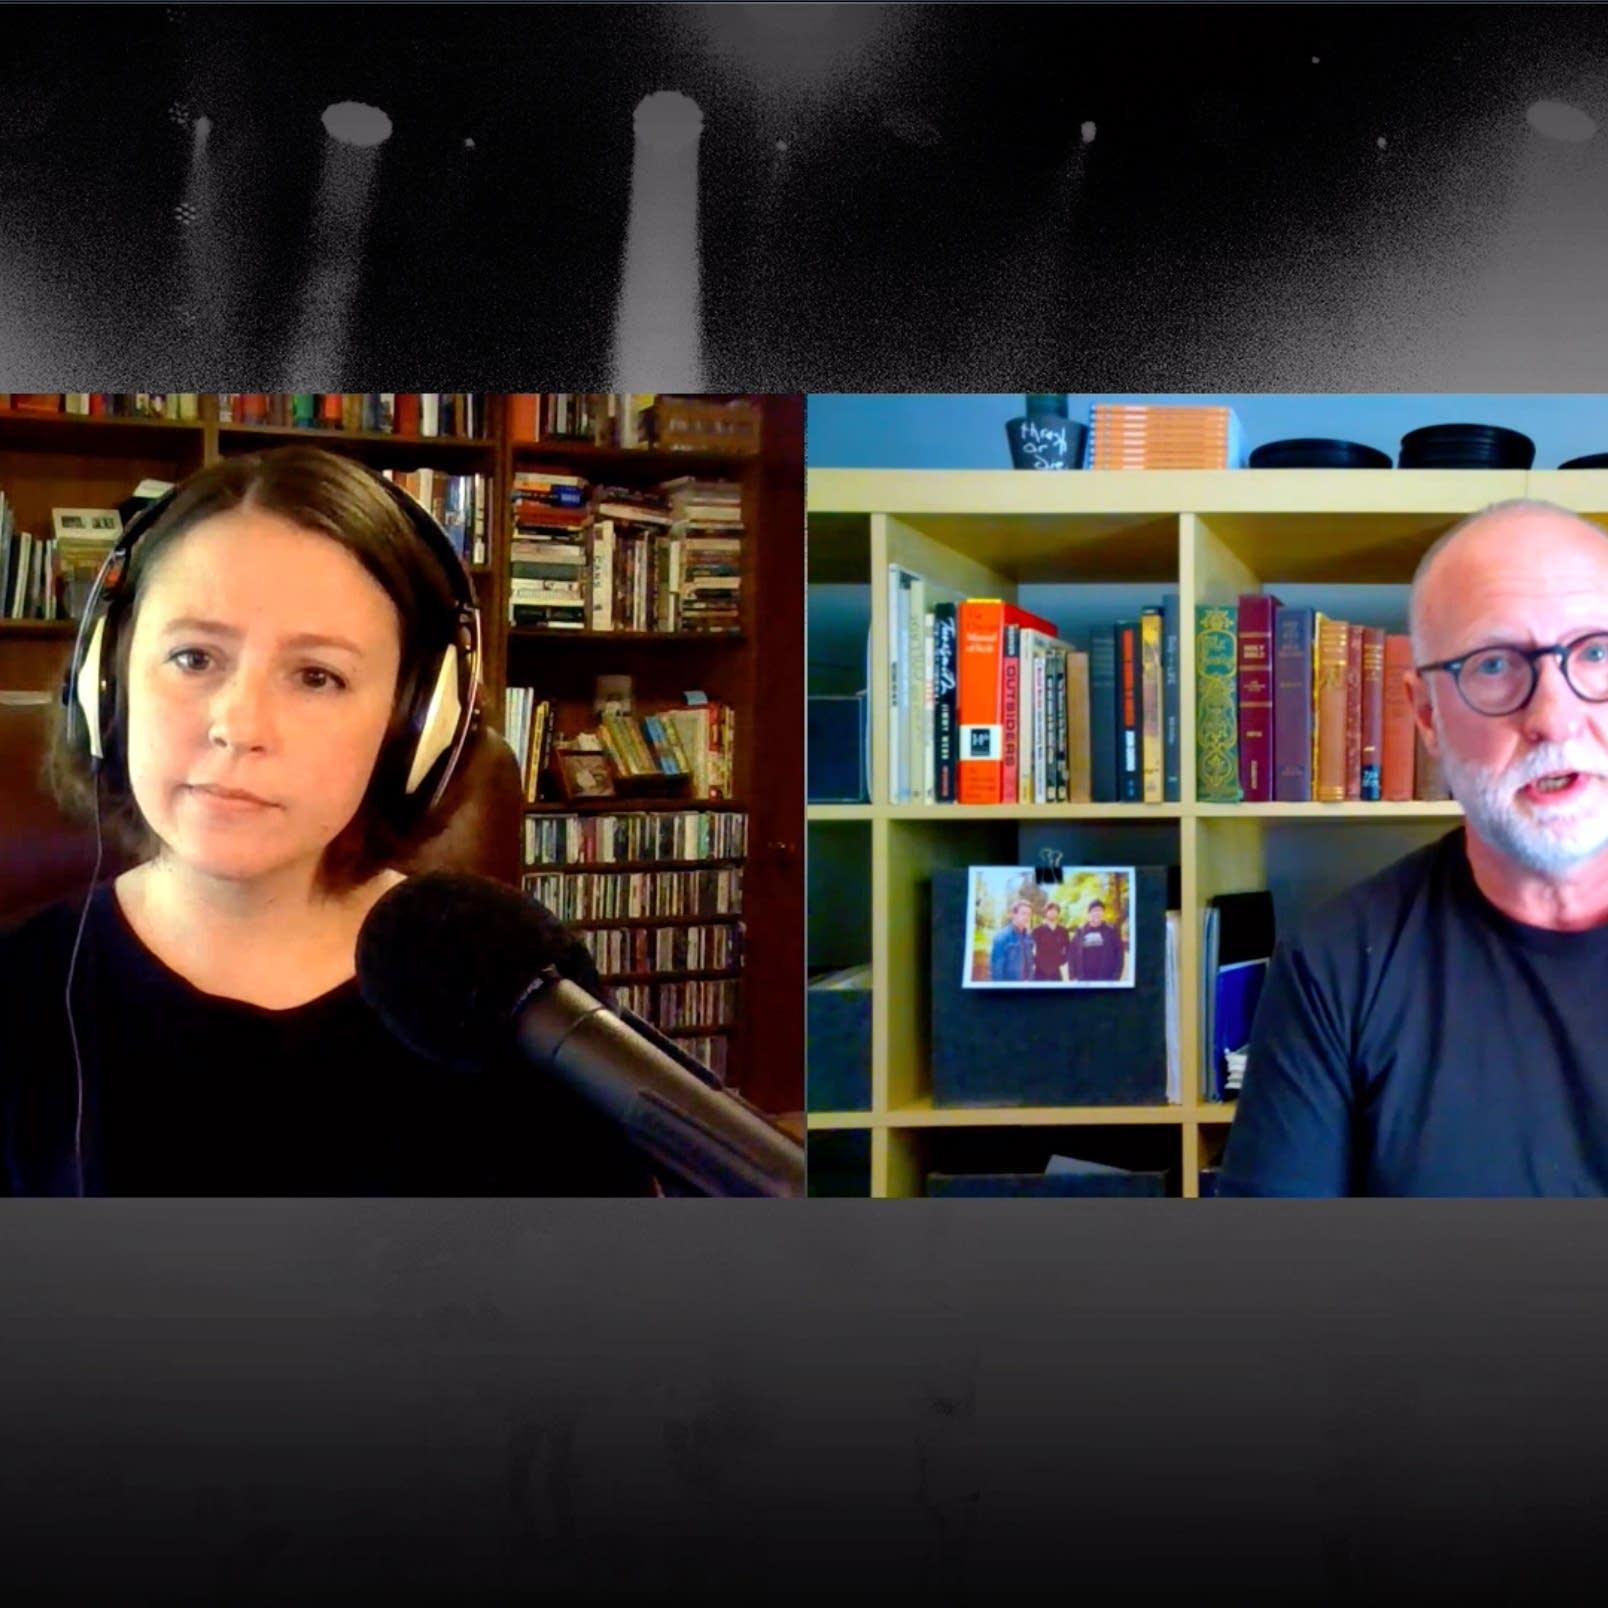 Andrea Swensson interviews Bob Mould